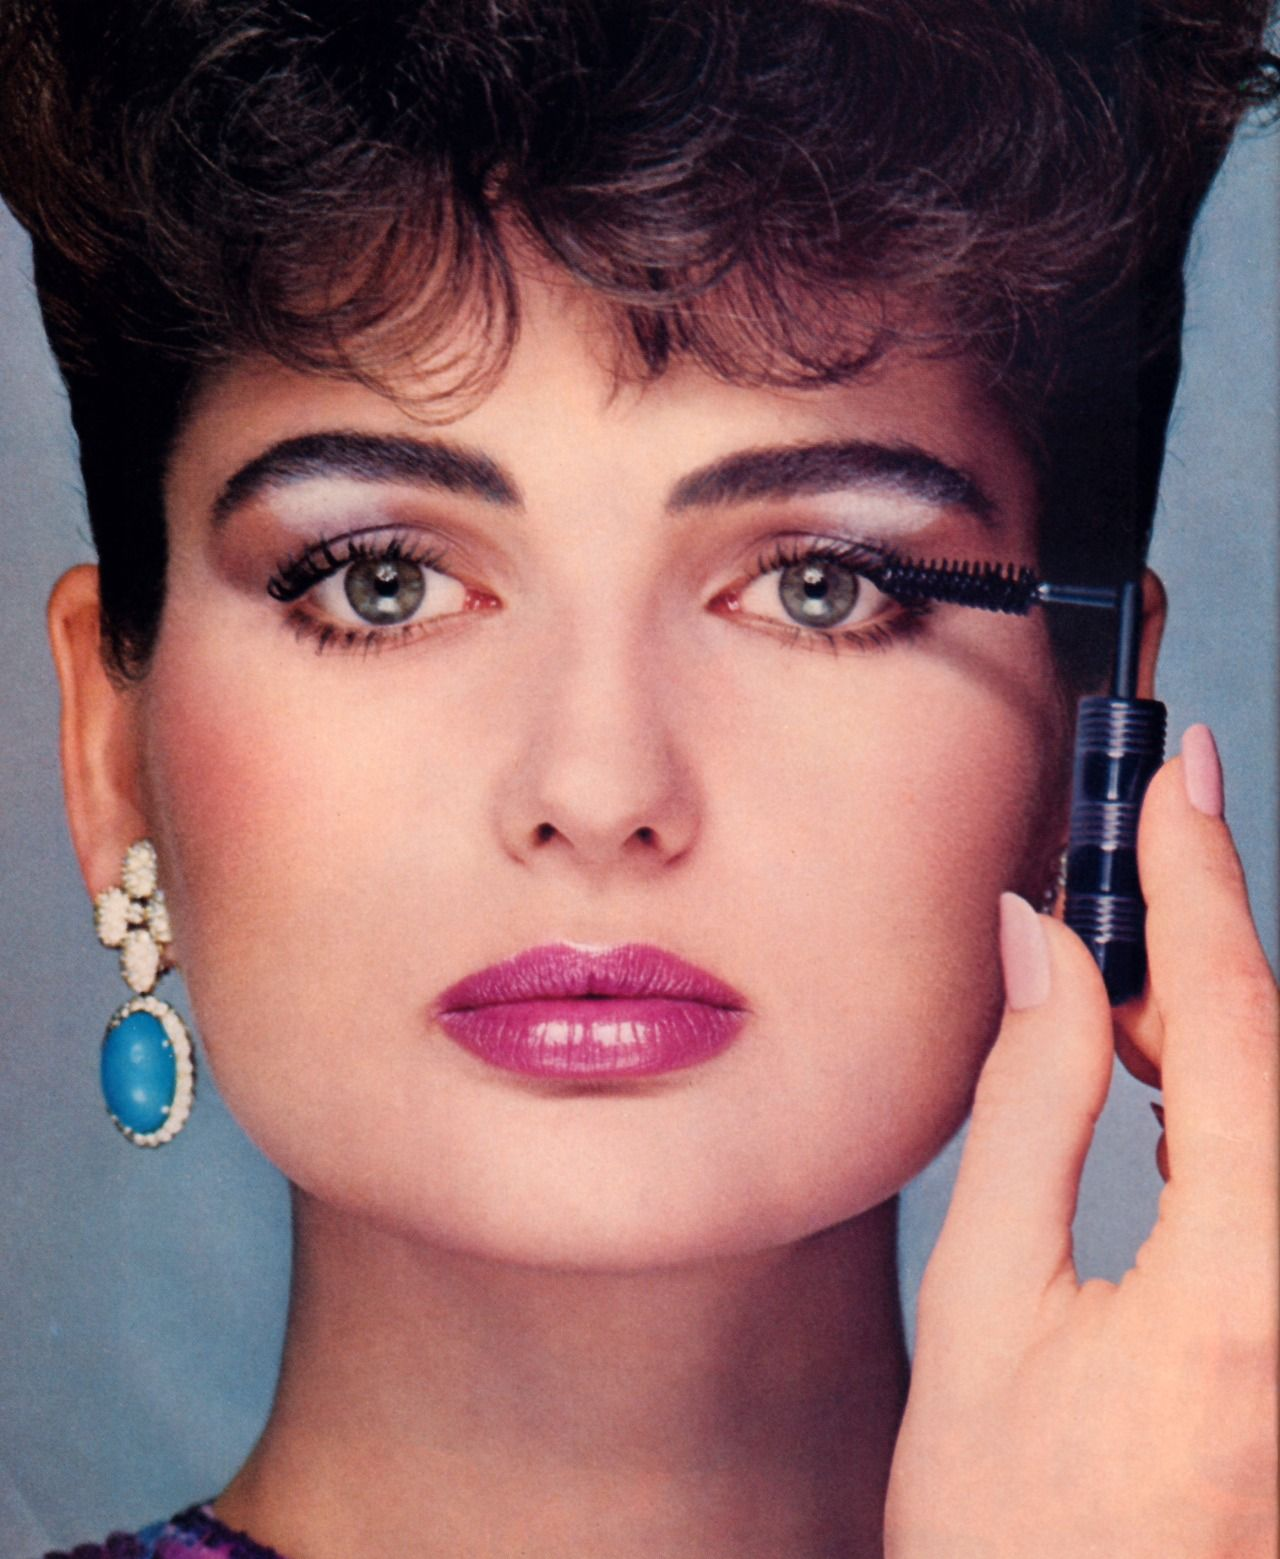 Revlon, American Vogue, February 1983. 1980s makeup